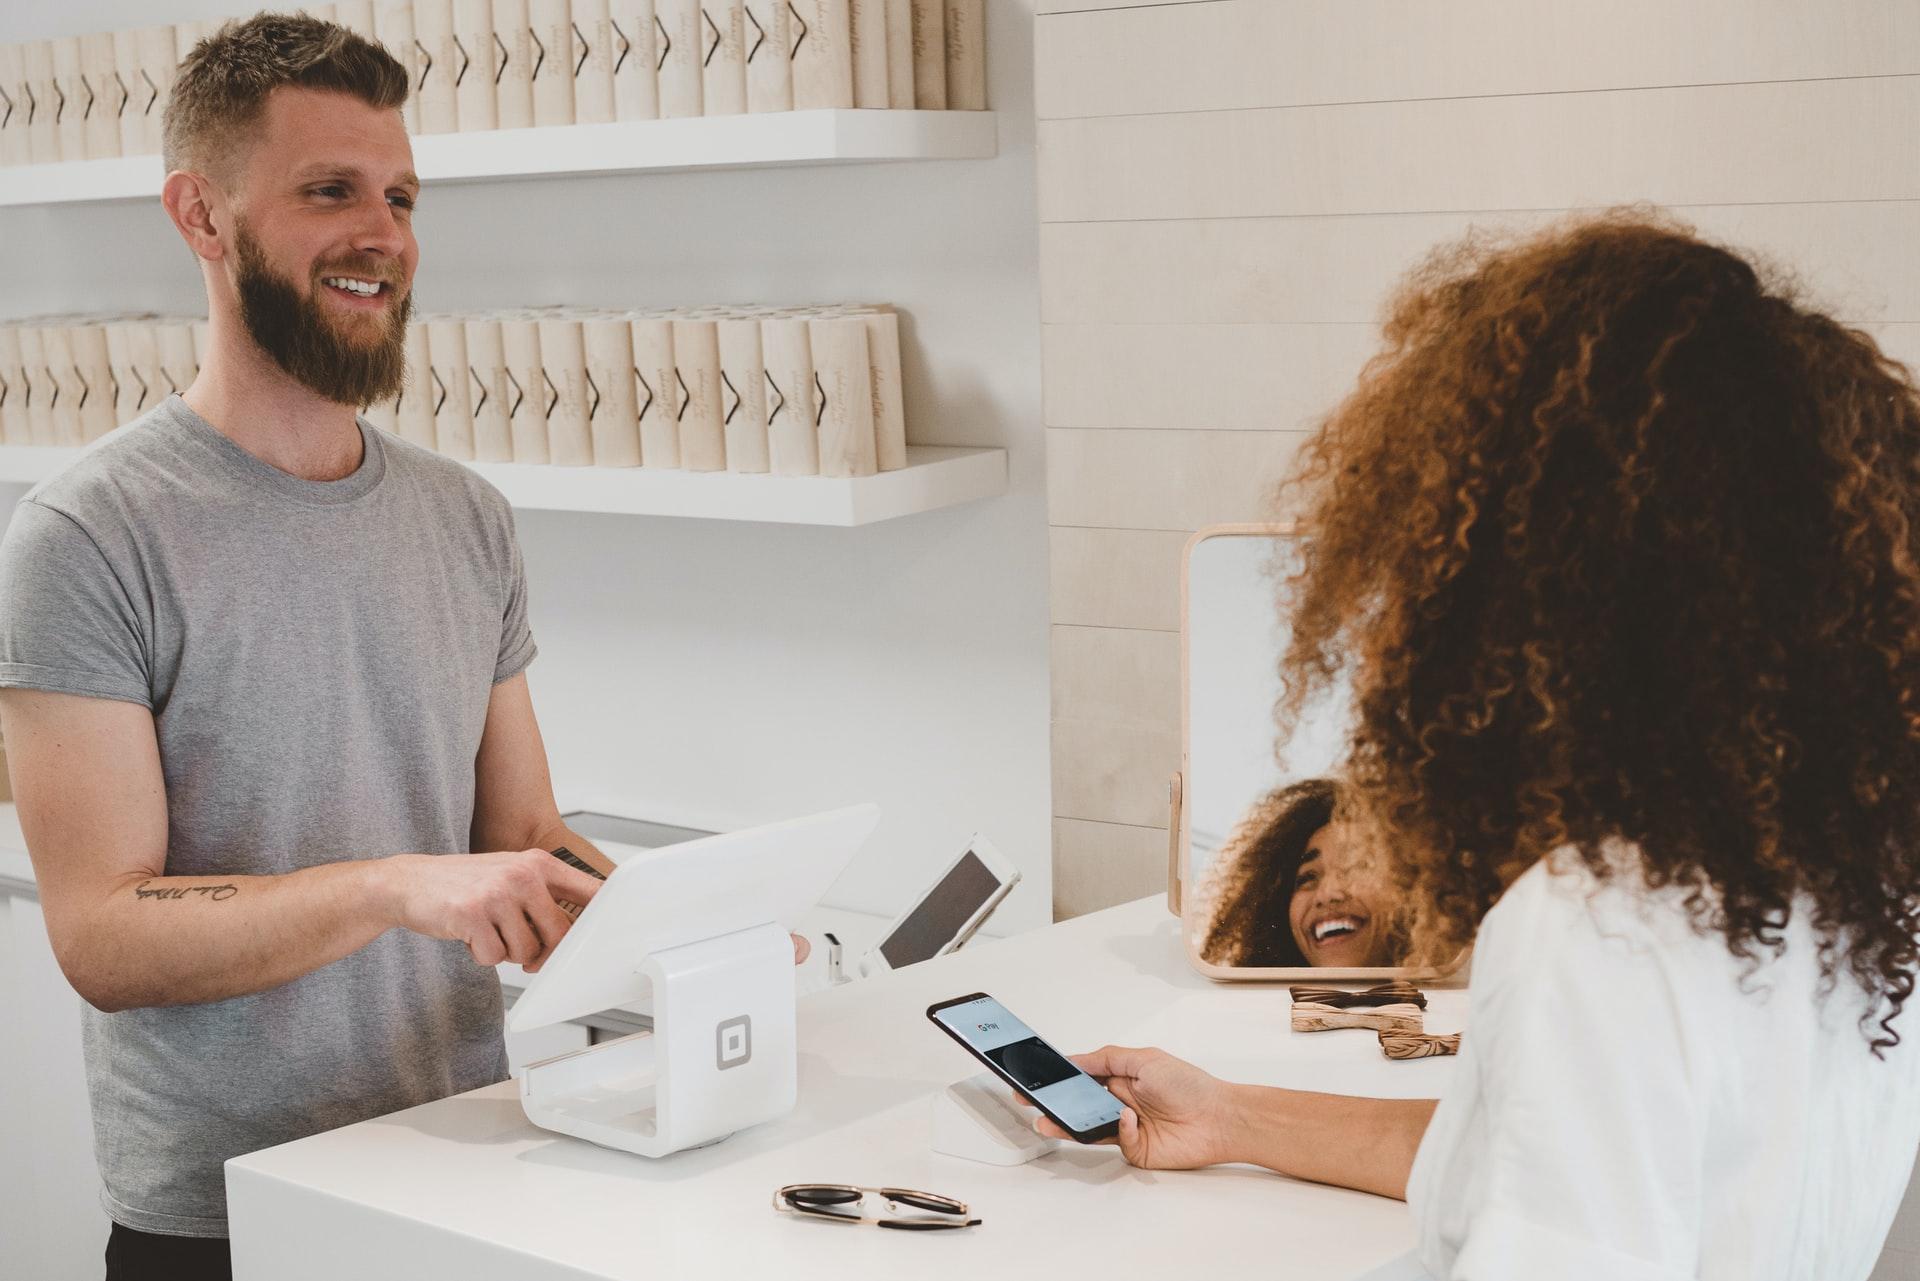 30 Kick-Ass Customer Service Tips (+ Real Examples)